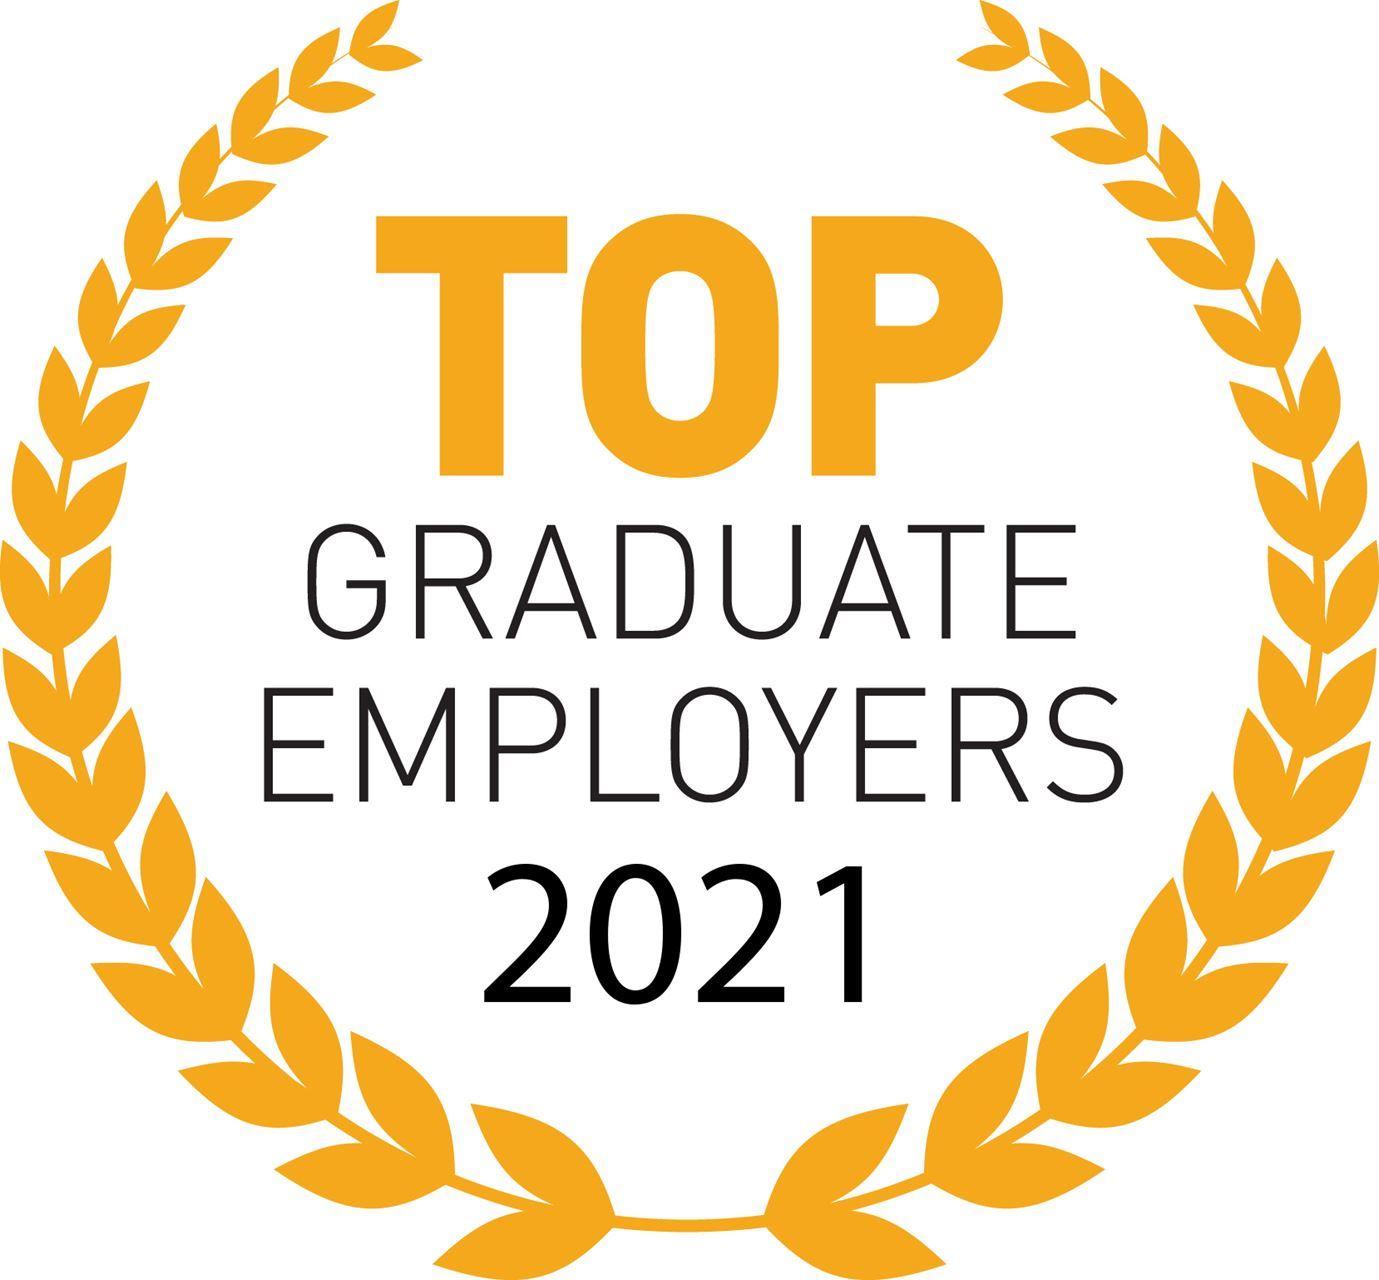 2021 Top Graduate Employers